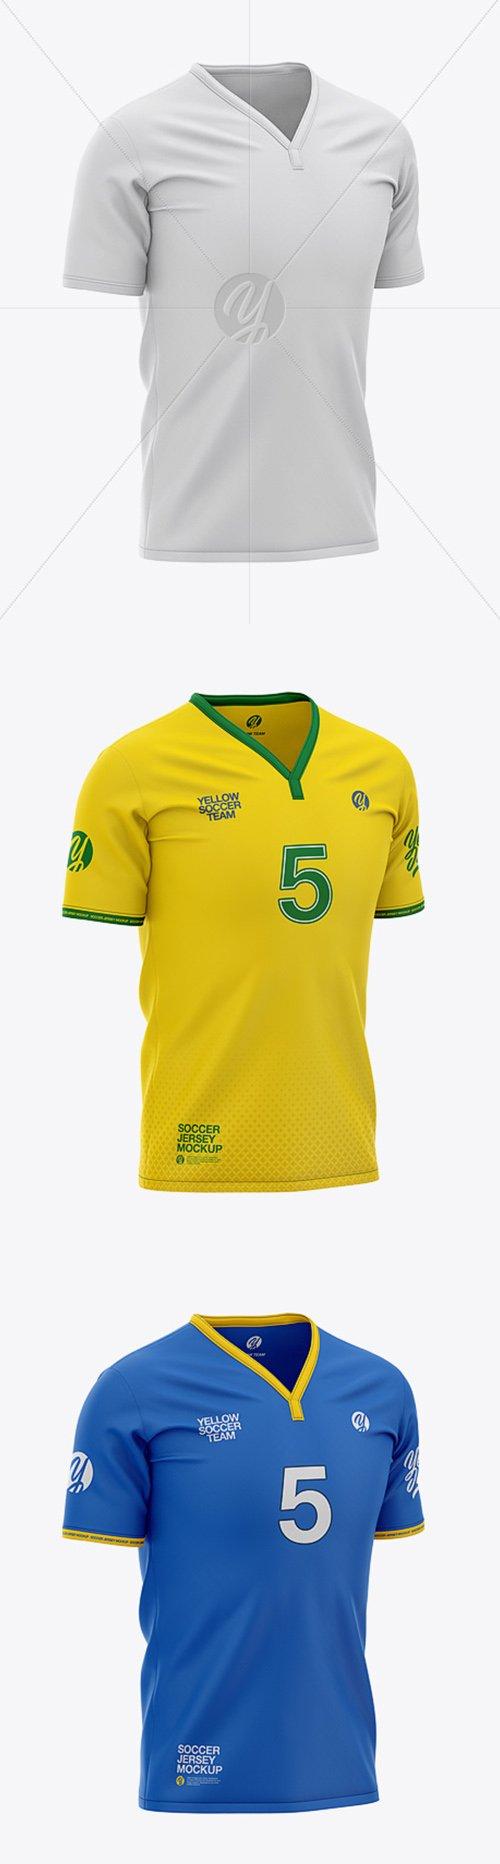 Mens Soccer Y-Neck Jersey Mockup - Front Half-Side View 37104